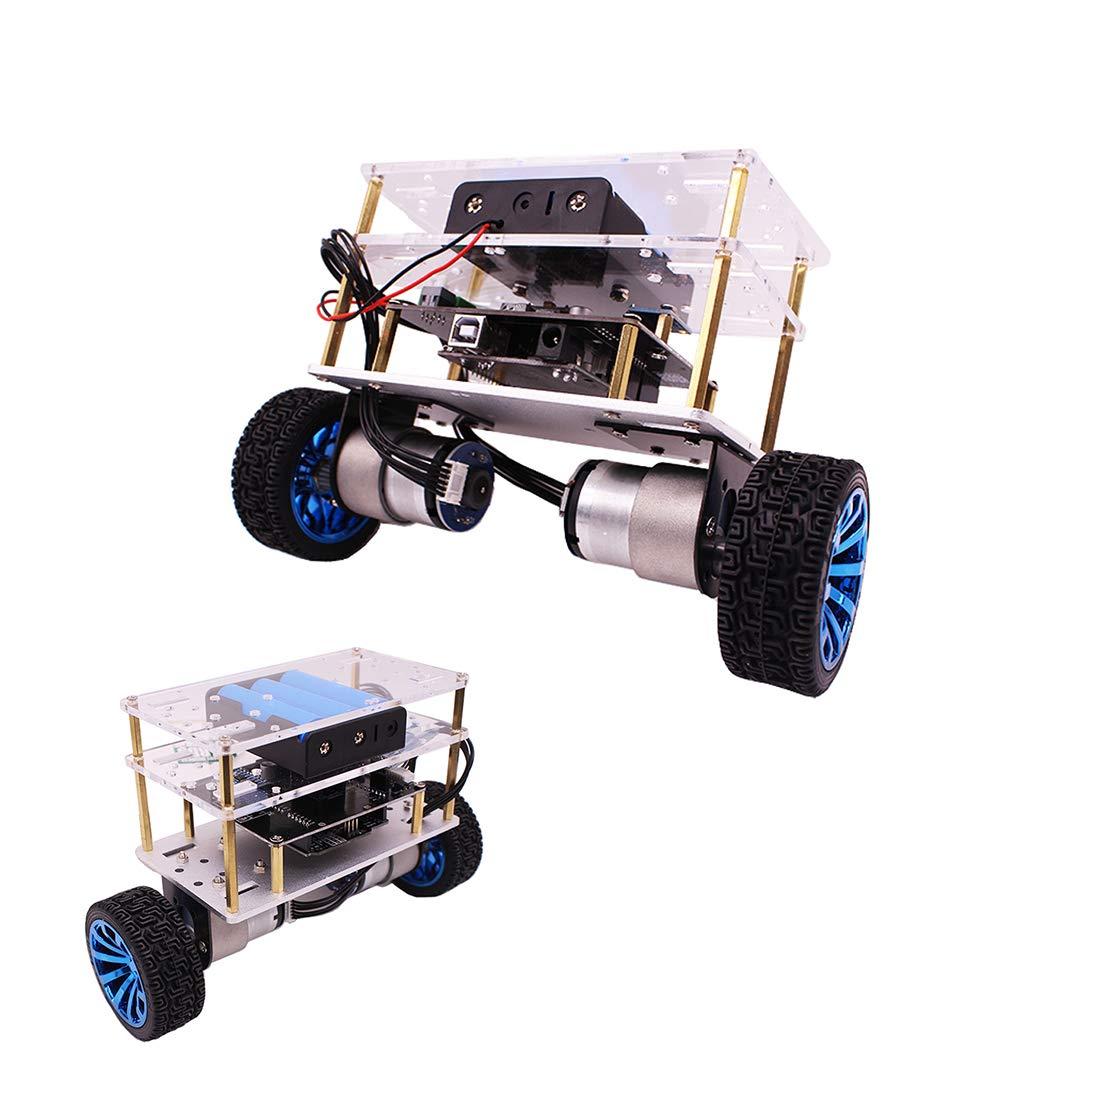 Prament Yahboom Prament Arduinoを搭載したスマートなロボットバランスカーUNO APP/Bluetooth制御 STEMロボット教育キットサポート重力誘導重量4.4 lb/Android APP/Bluetooth制御 B07MPTQBL8 B07MPTQBL8, FineStyle by Rakuten BRANDAVENUE:a49cf445 --- 2017.goldenesbrett.net